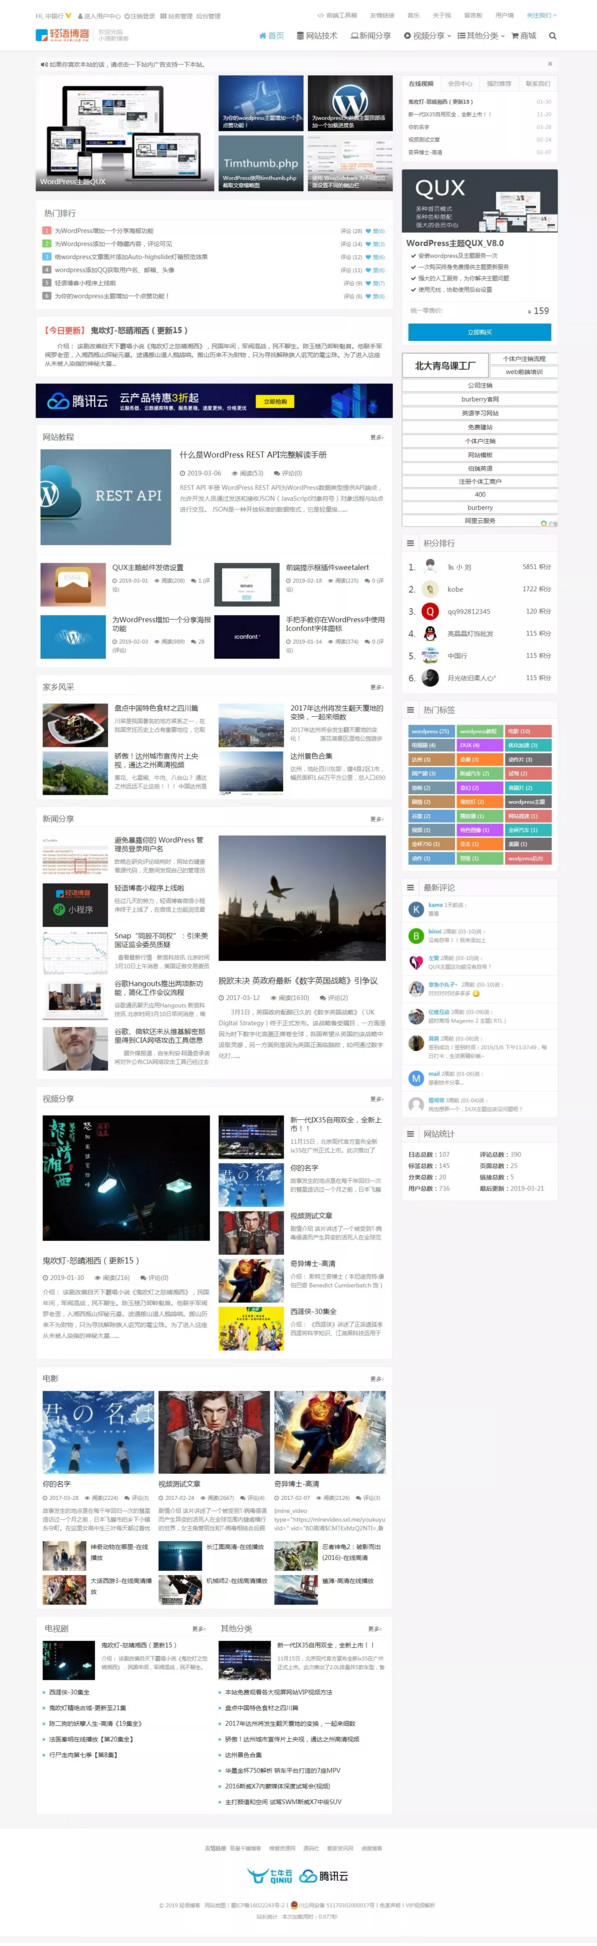 WordPress主题QUX DUX加强版[更新至9.1]